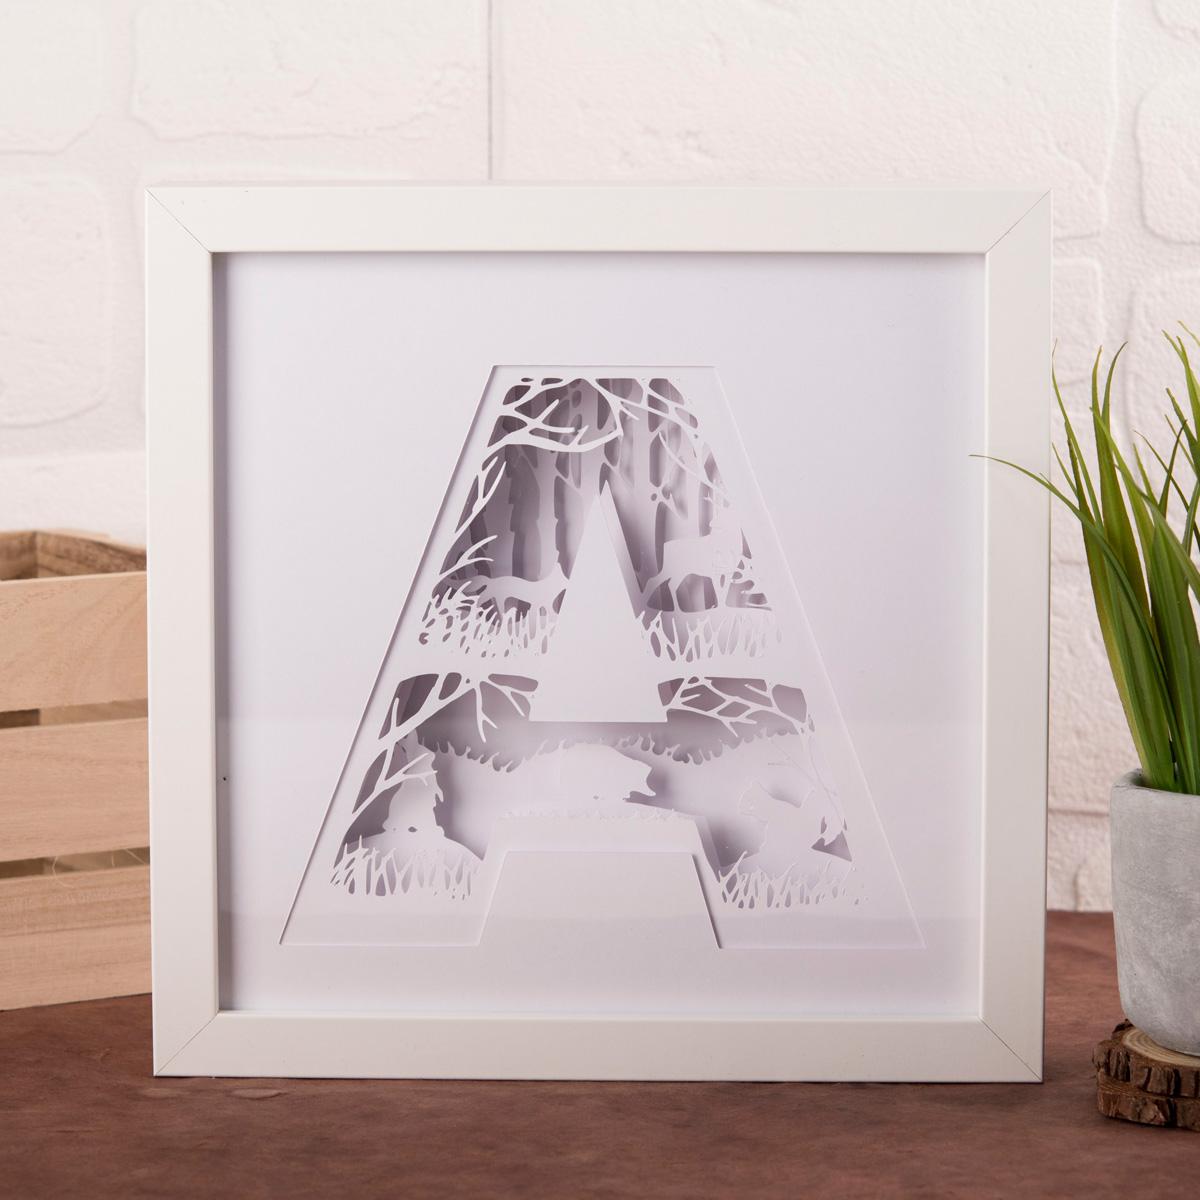 Image of A-Z Alphabet Framed Papercut Mood Light